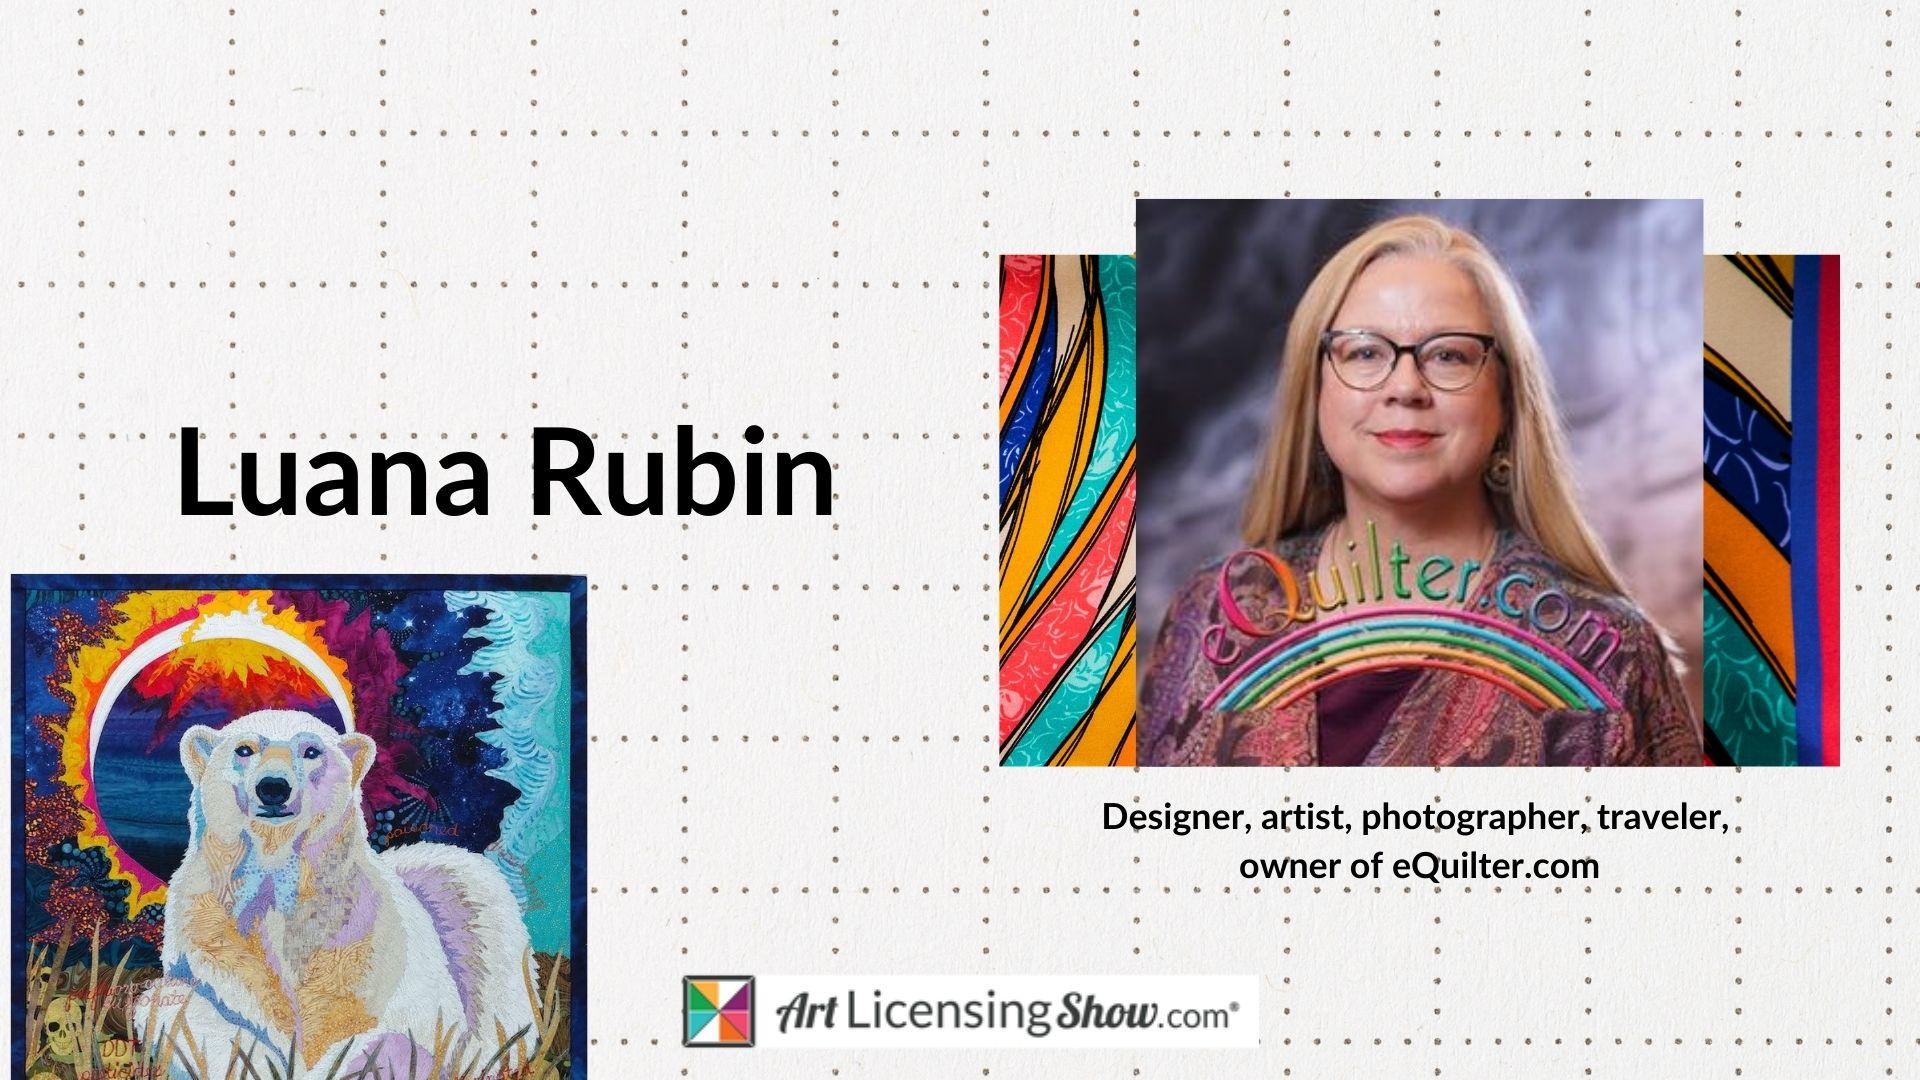 Luana Rubin - artist, designer, quilter, buyer, creator equilter.com